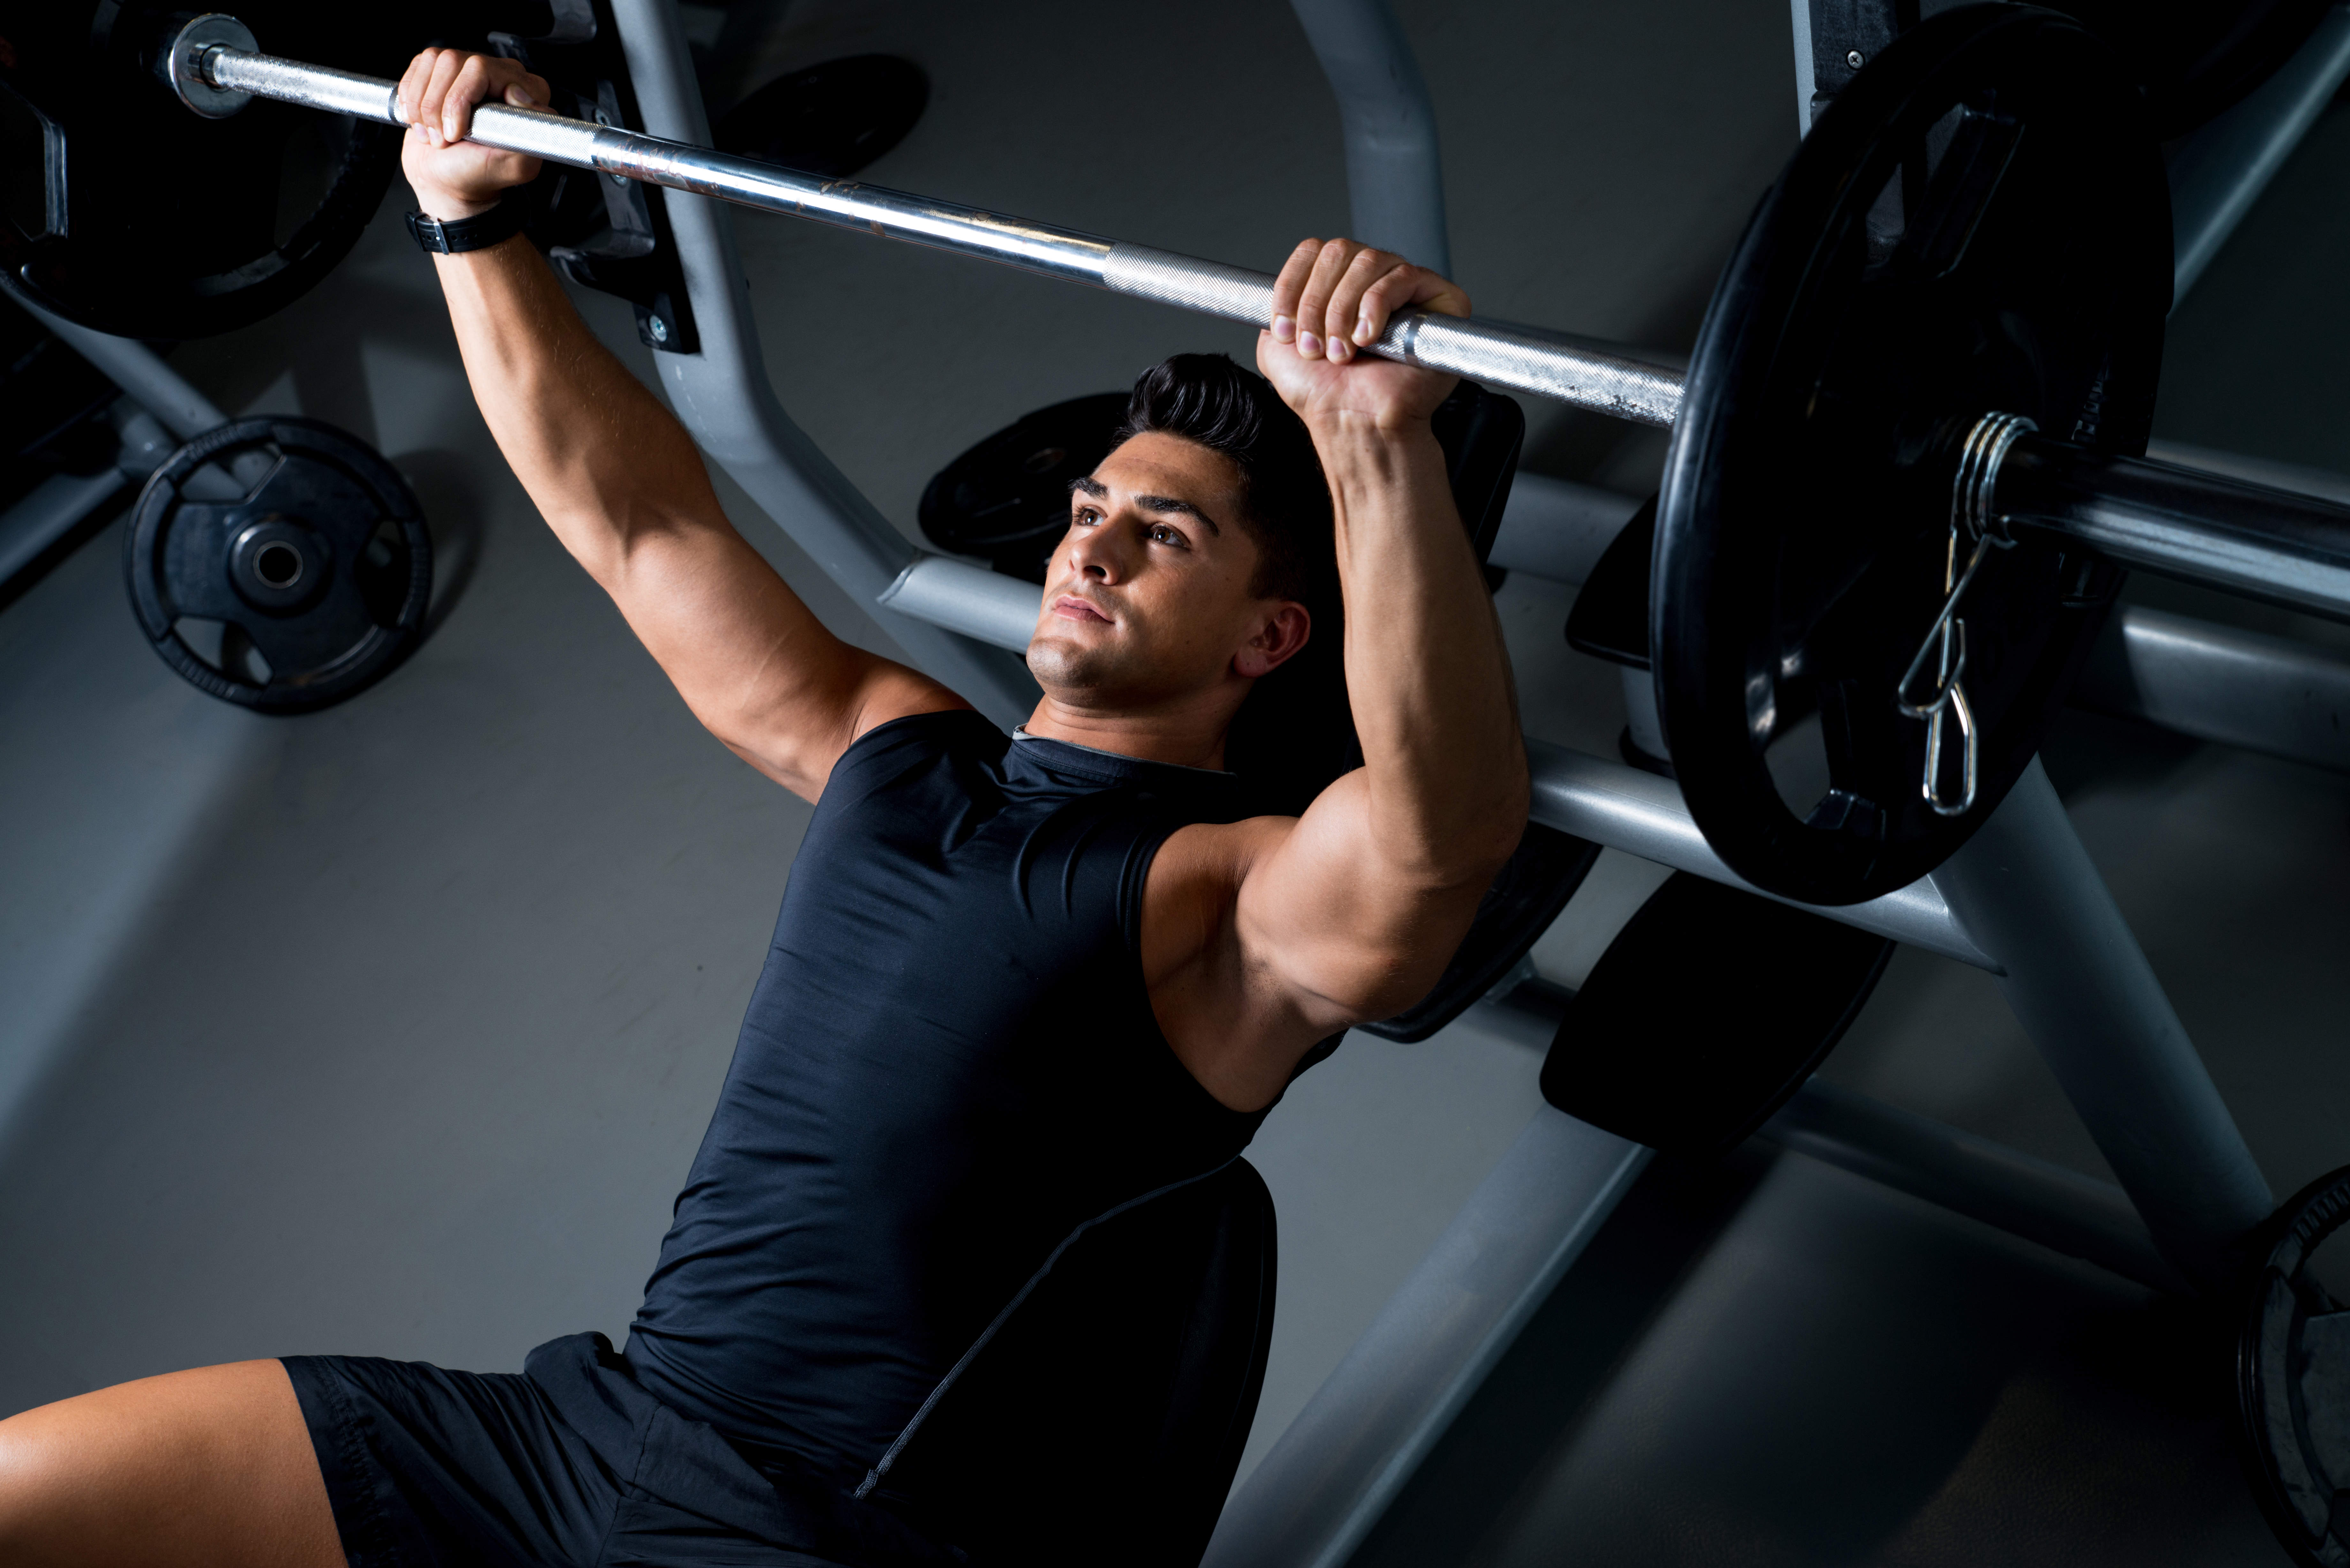 bench press, bank drukken, compound oefeningen, fitness oefeningen